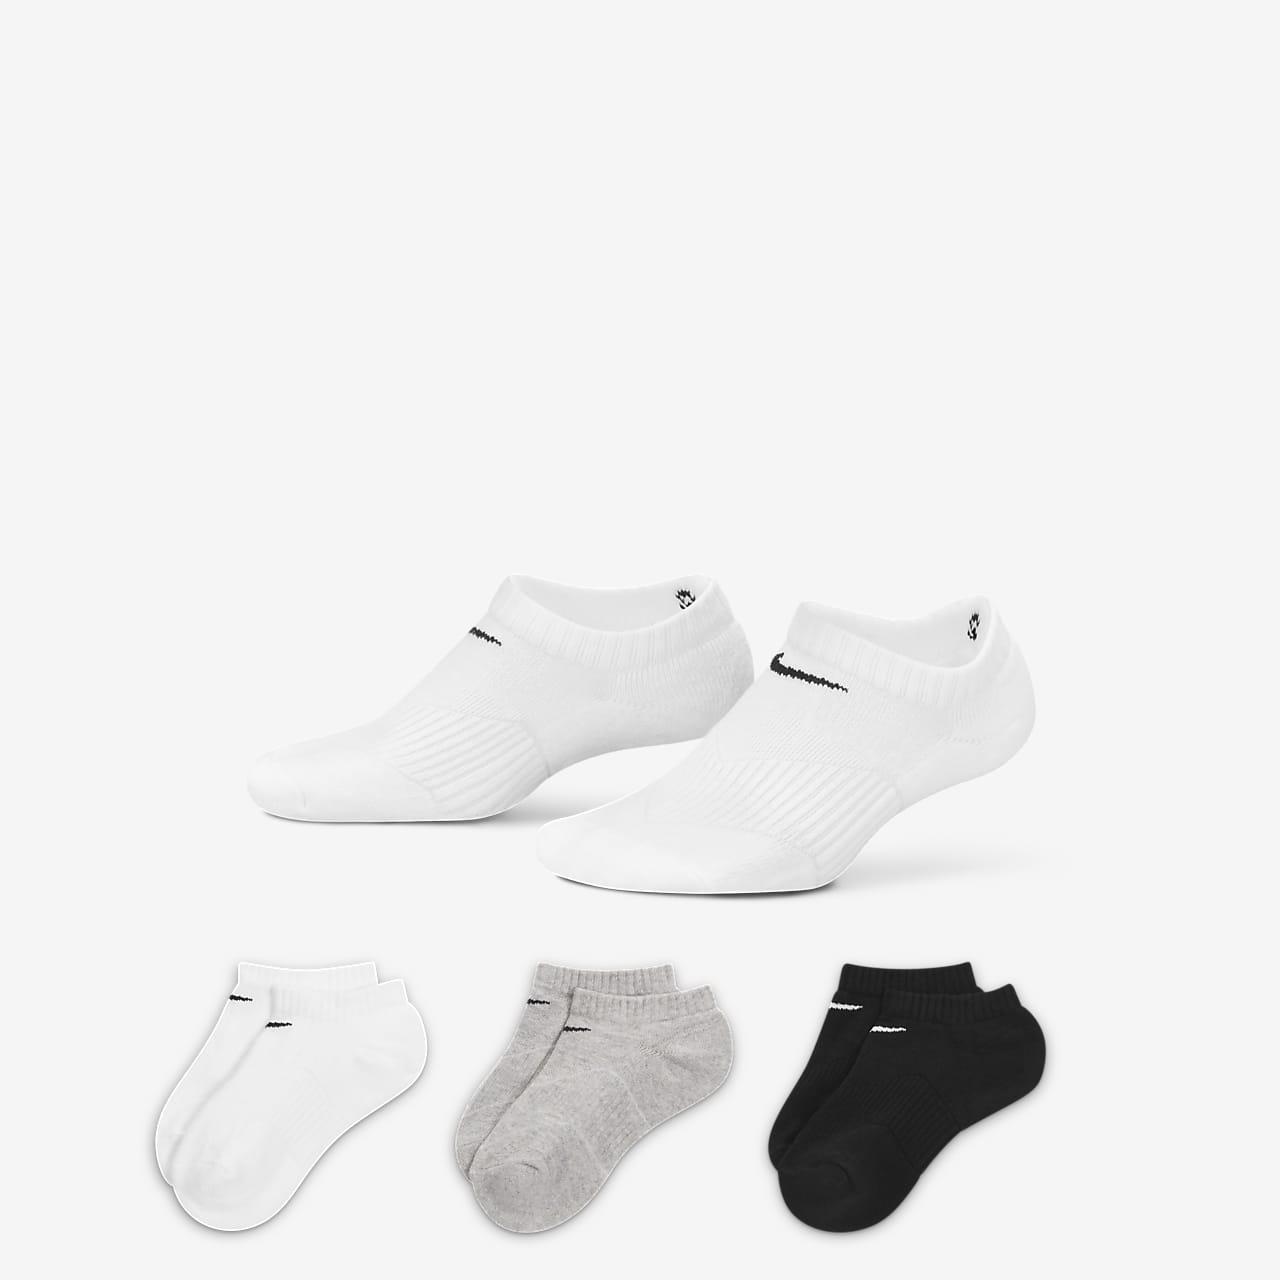 Nike Performance Cushion No-Show Big Kids' Socks (3 Pair)